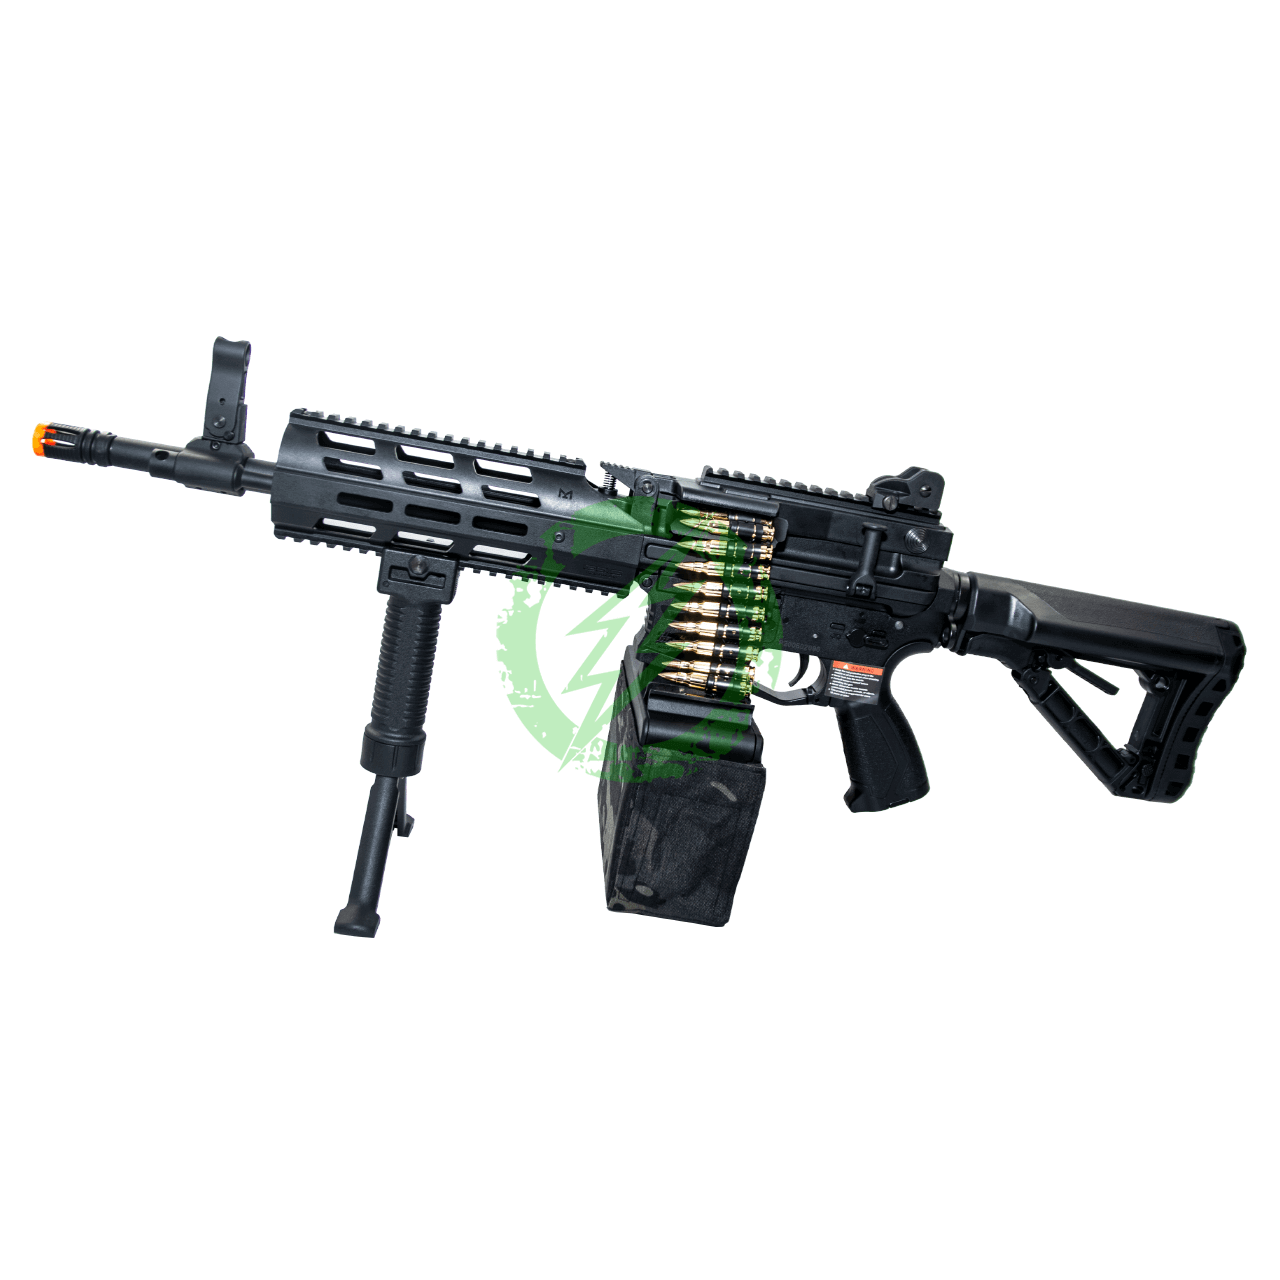 G&G Combat Machine CM16 LMG Stealth left